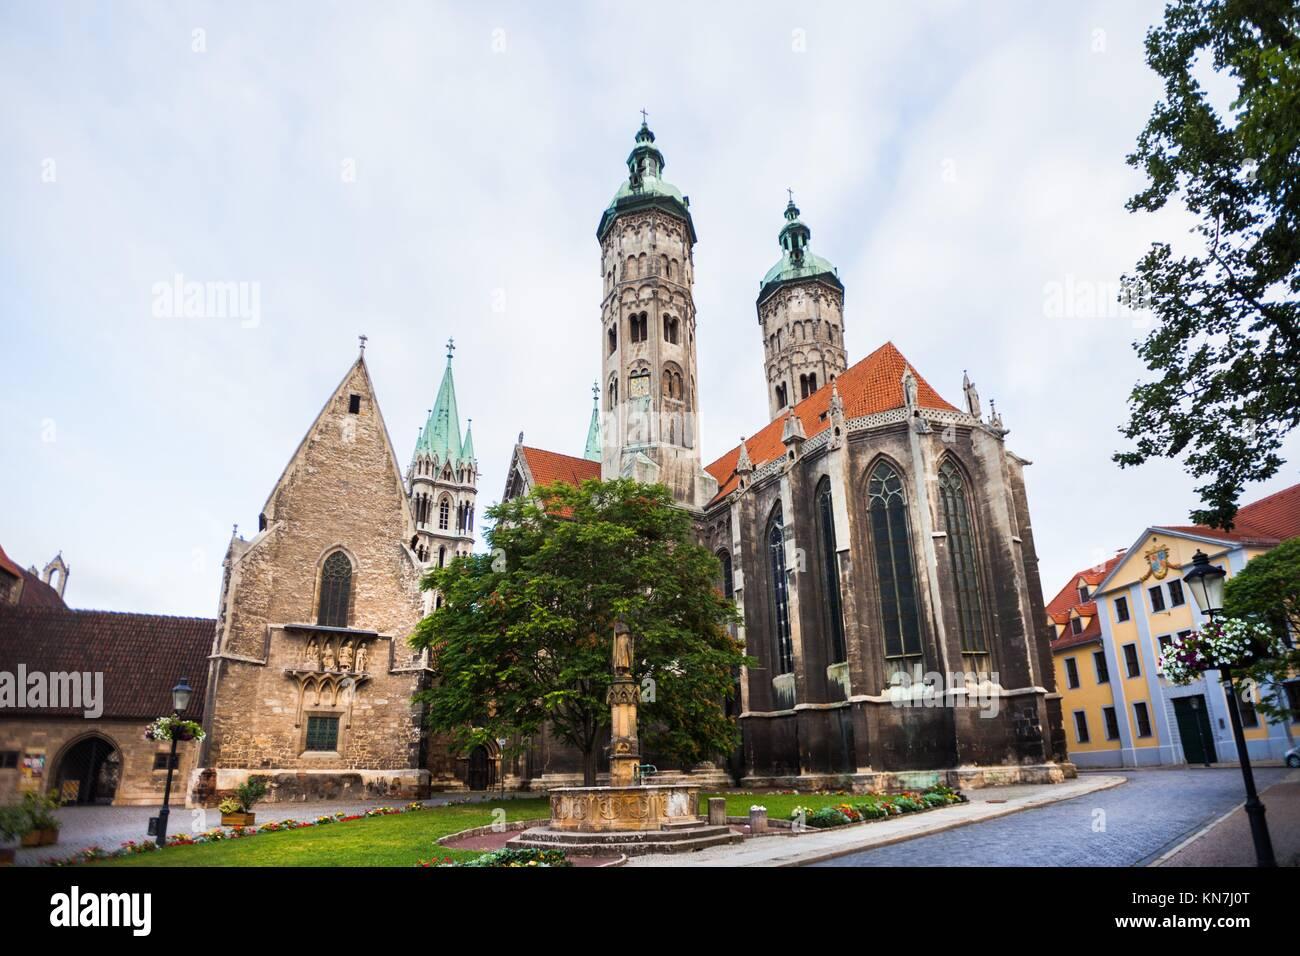 Naumburger Dom (Naumburg Cathedral), Naumburg an der Saale, Germany. Stock Photo